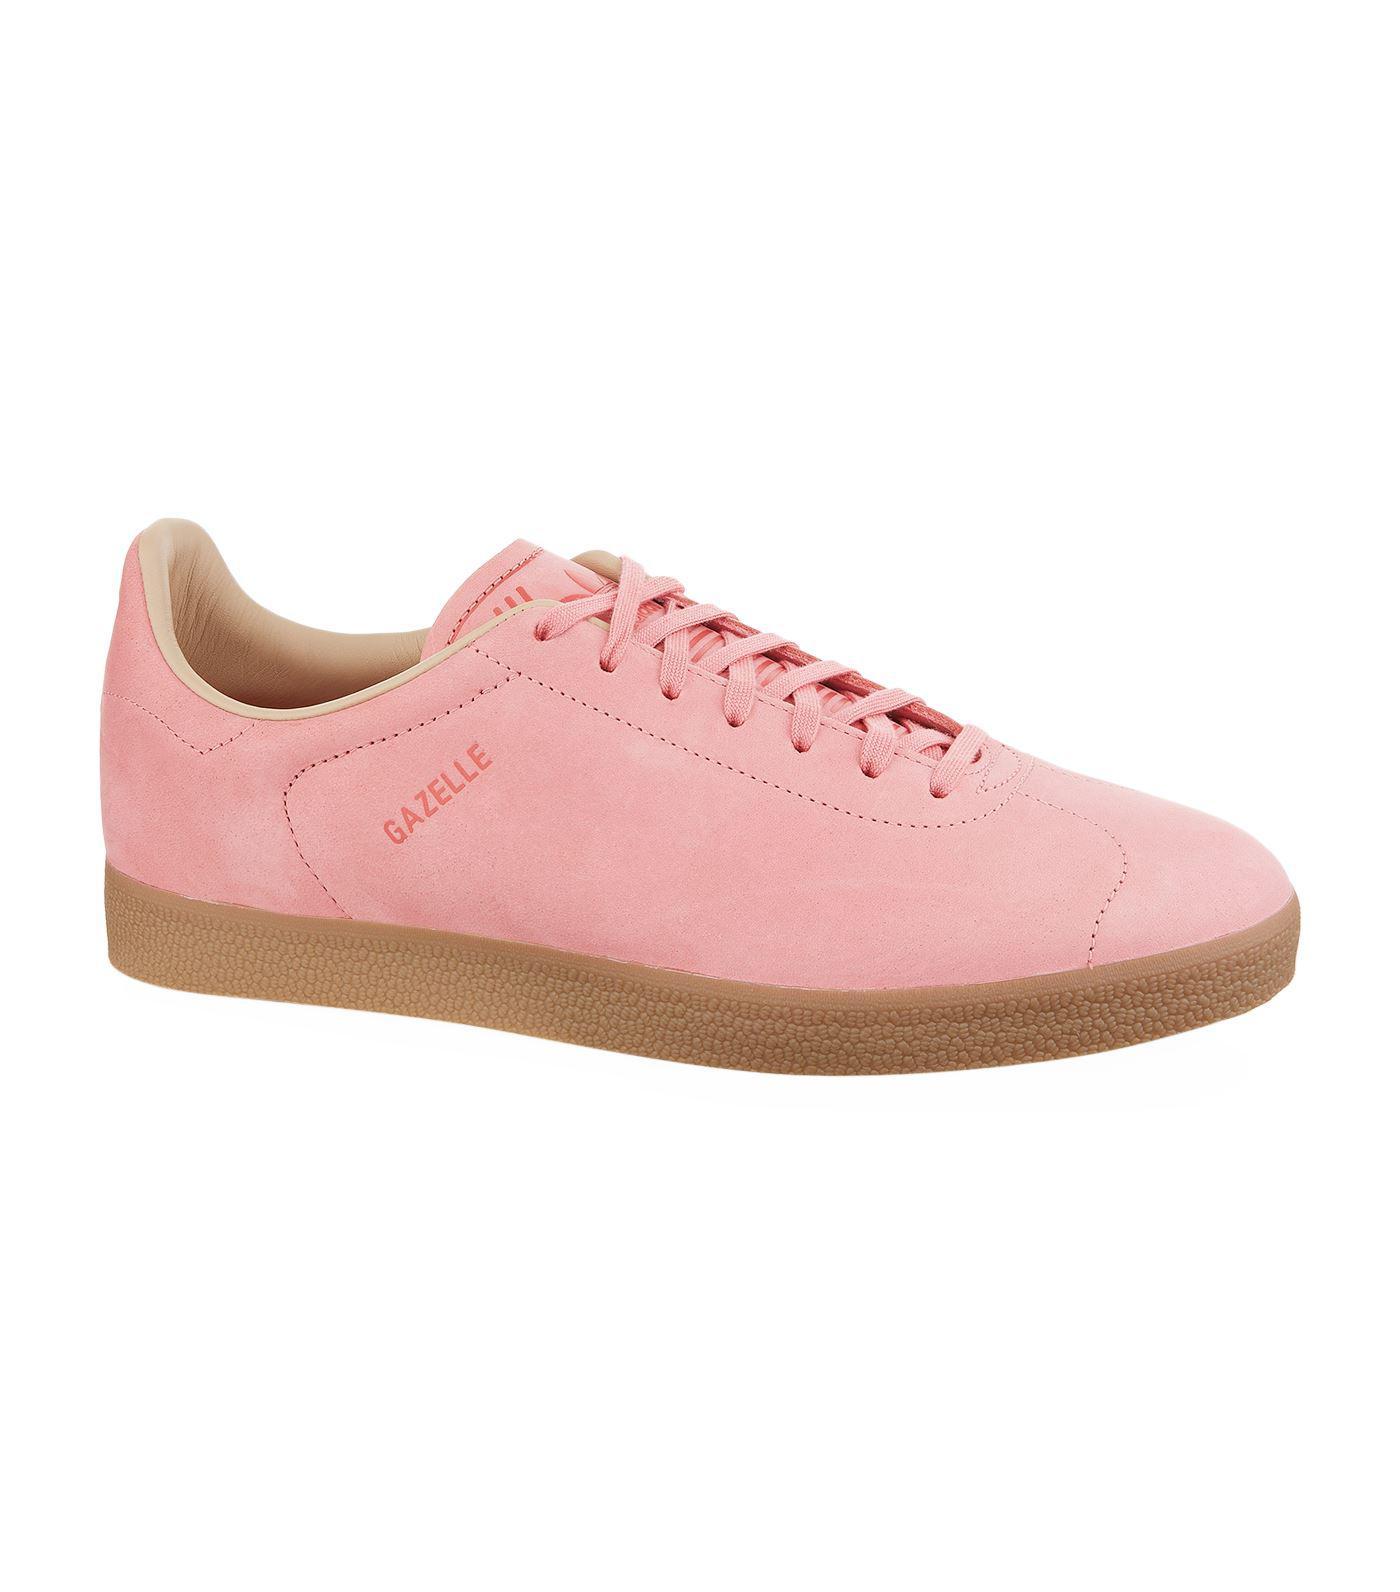 d7b4dee362f adidas Originals Gazelle Decon Sneakers in Pink - Lyst